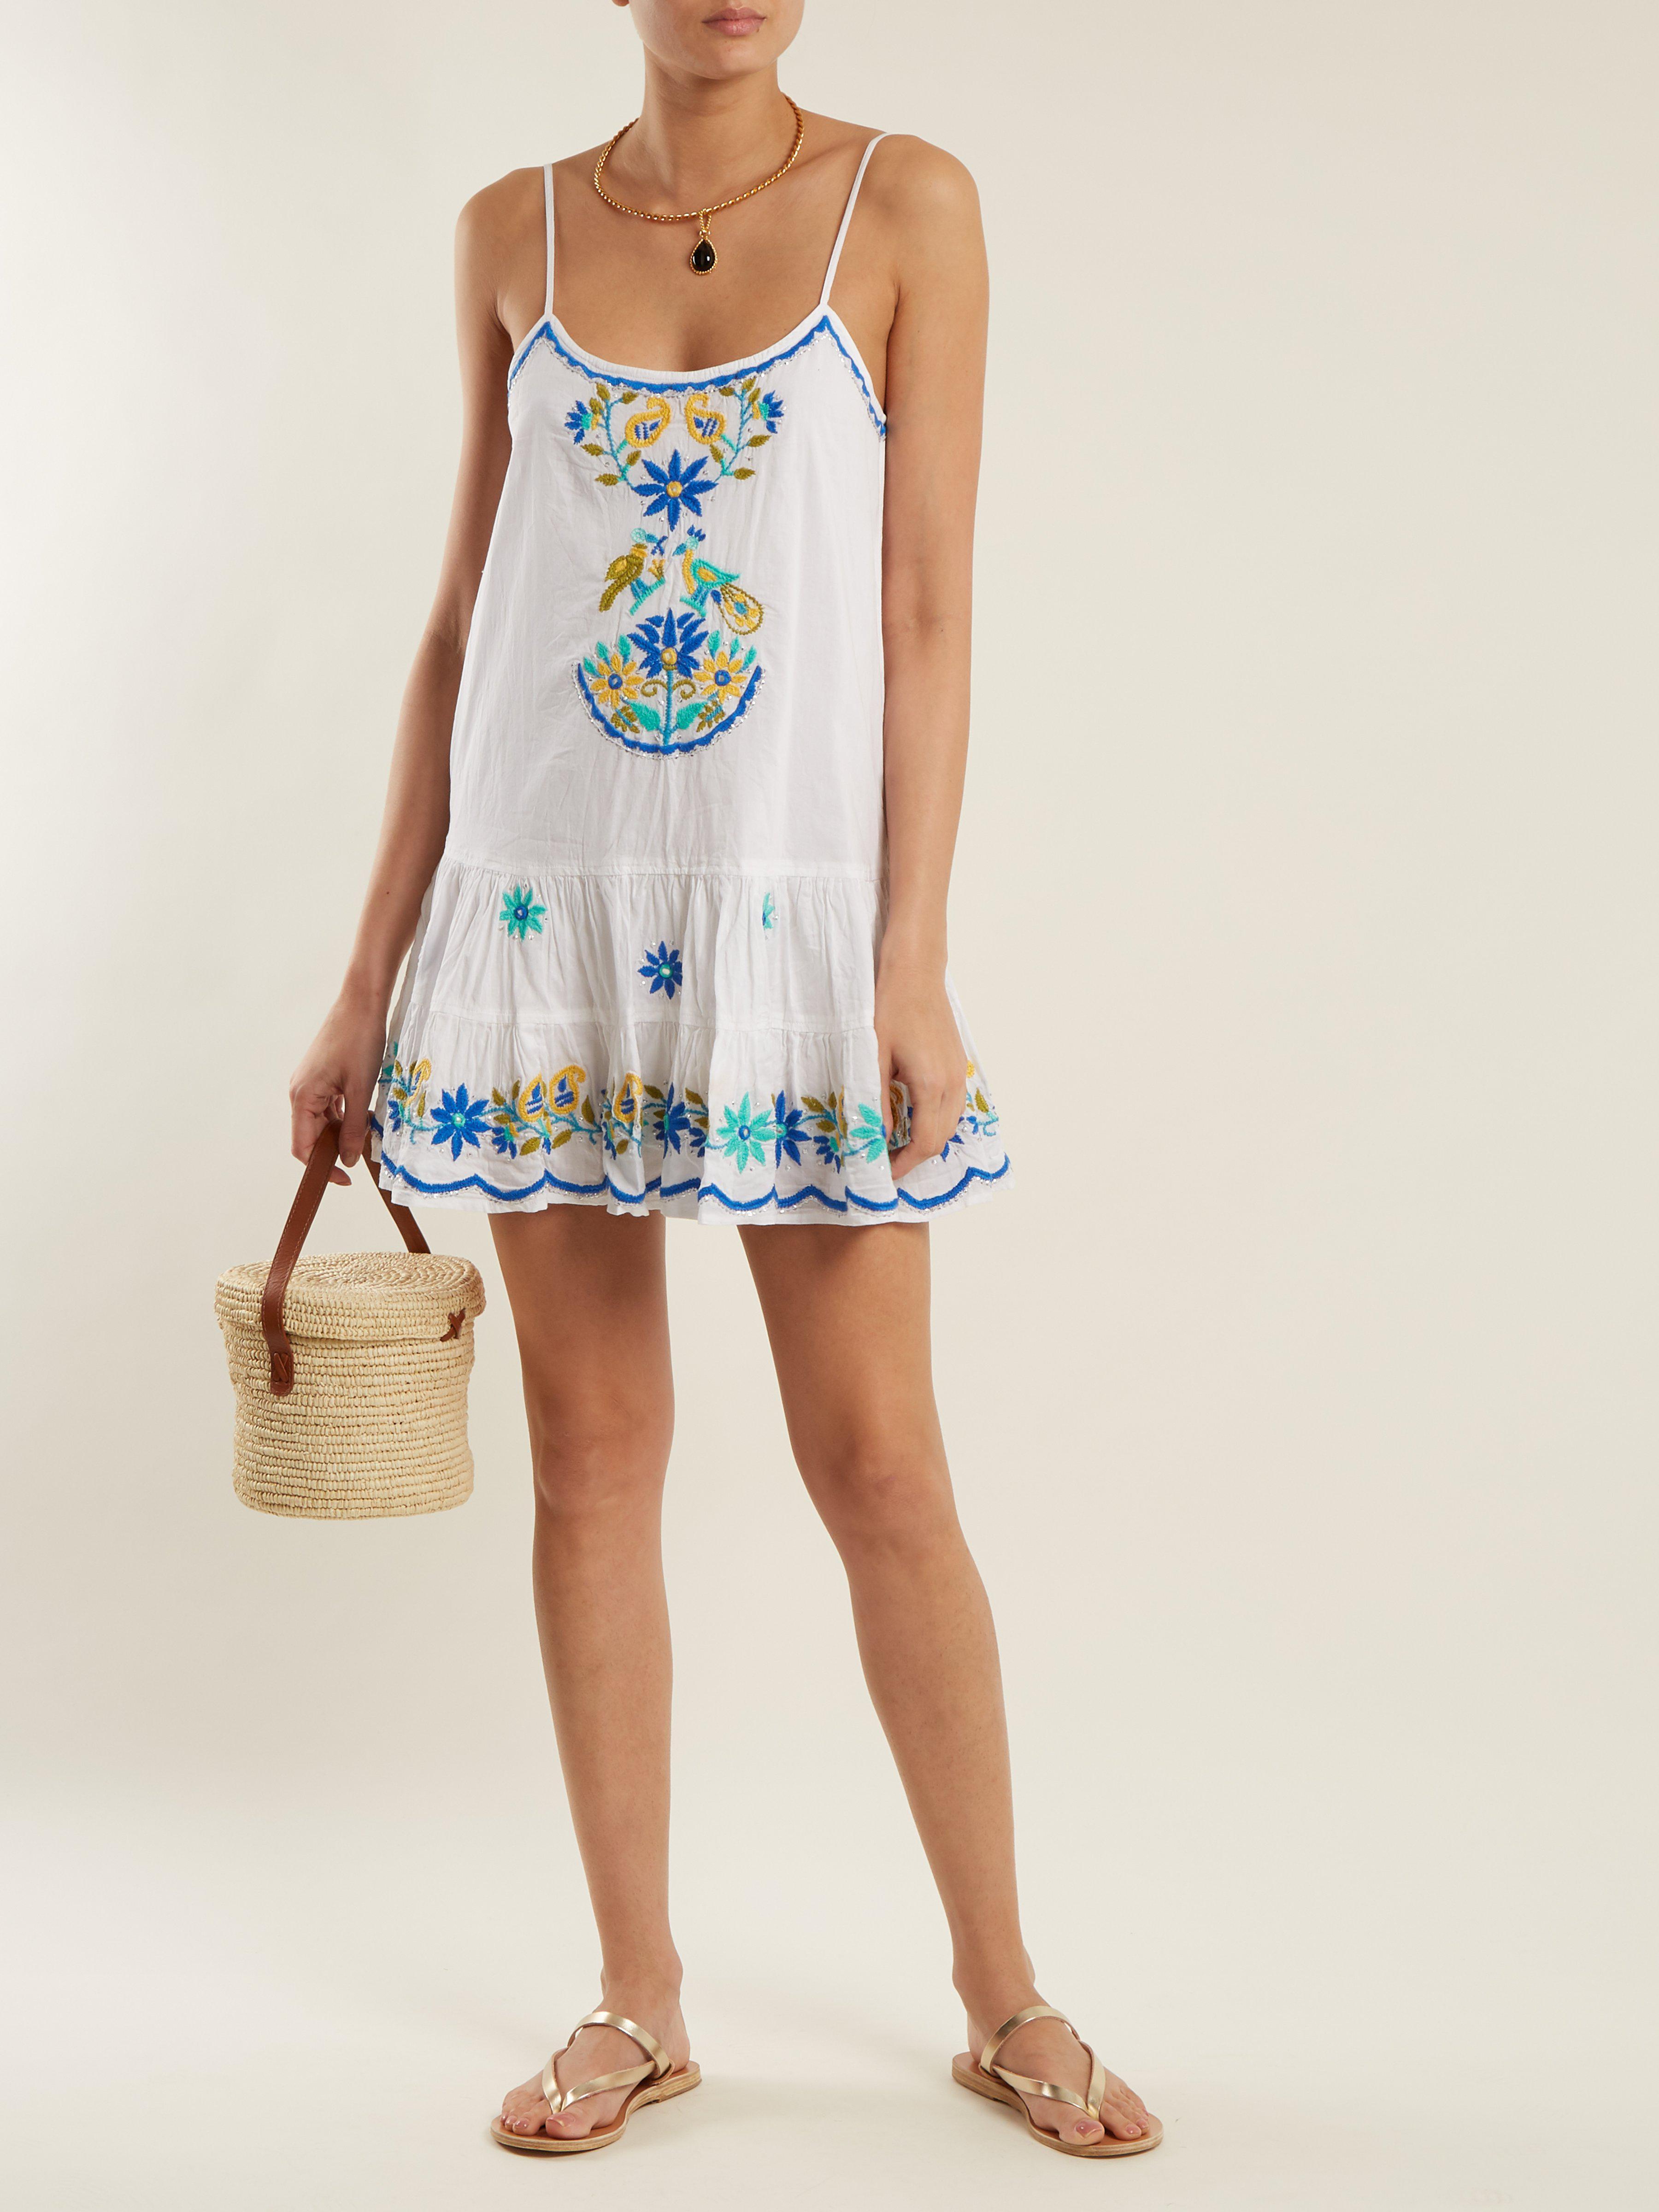 Vestido azul bordado de Dunn algodón de Lyst floral Juliet BxBqr7w4